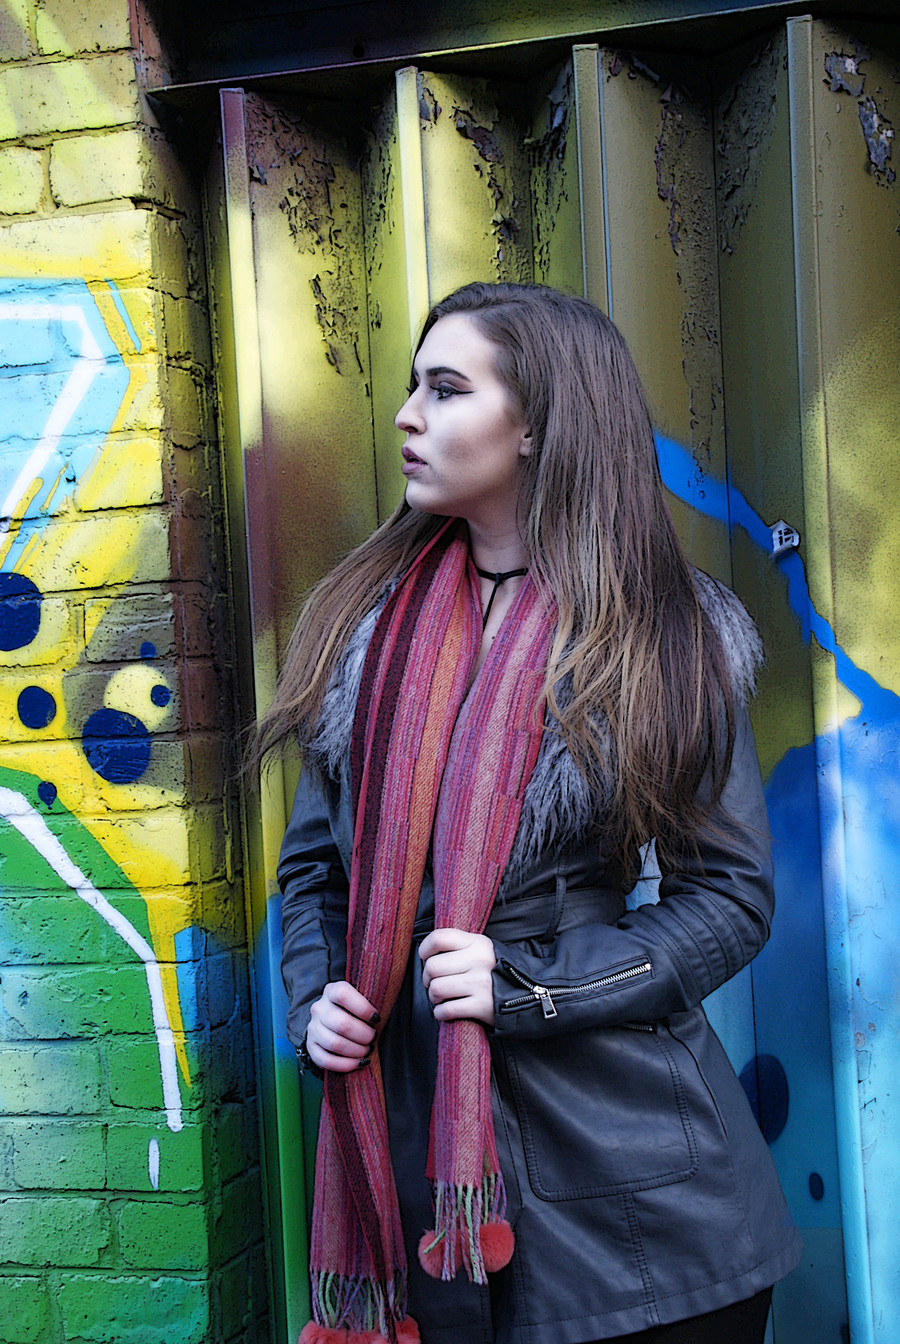 Demi Graffitti 2 / Photography by Brigadier, Model Demi Hughes / Uploaded 4th December 2017 @ 03:29 PM